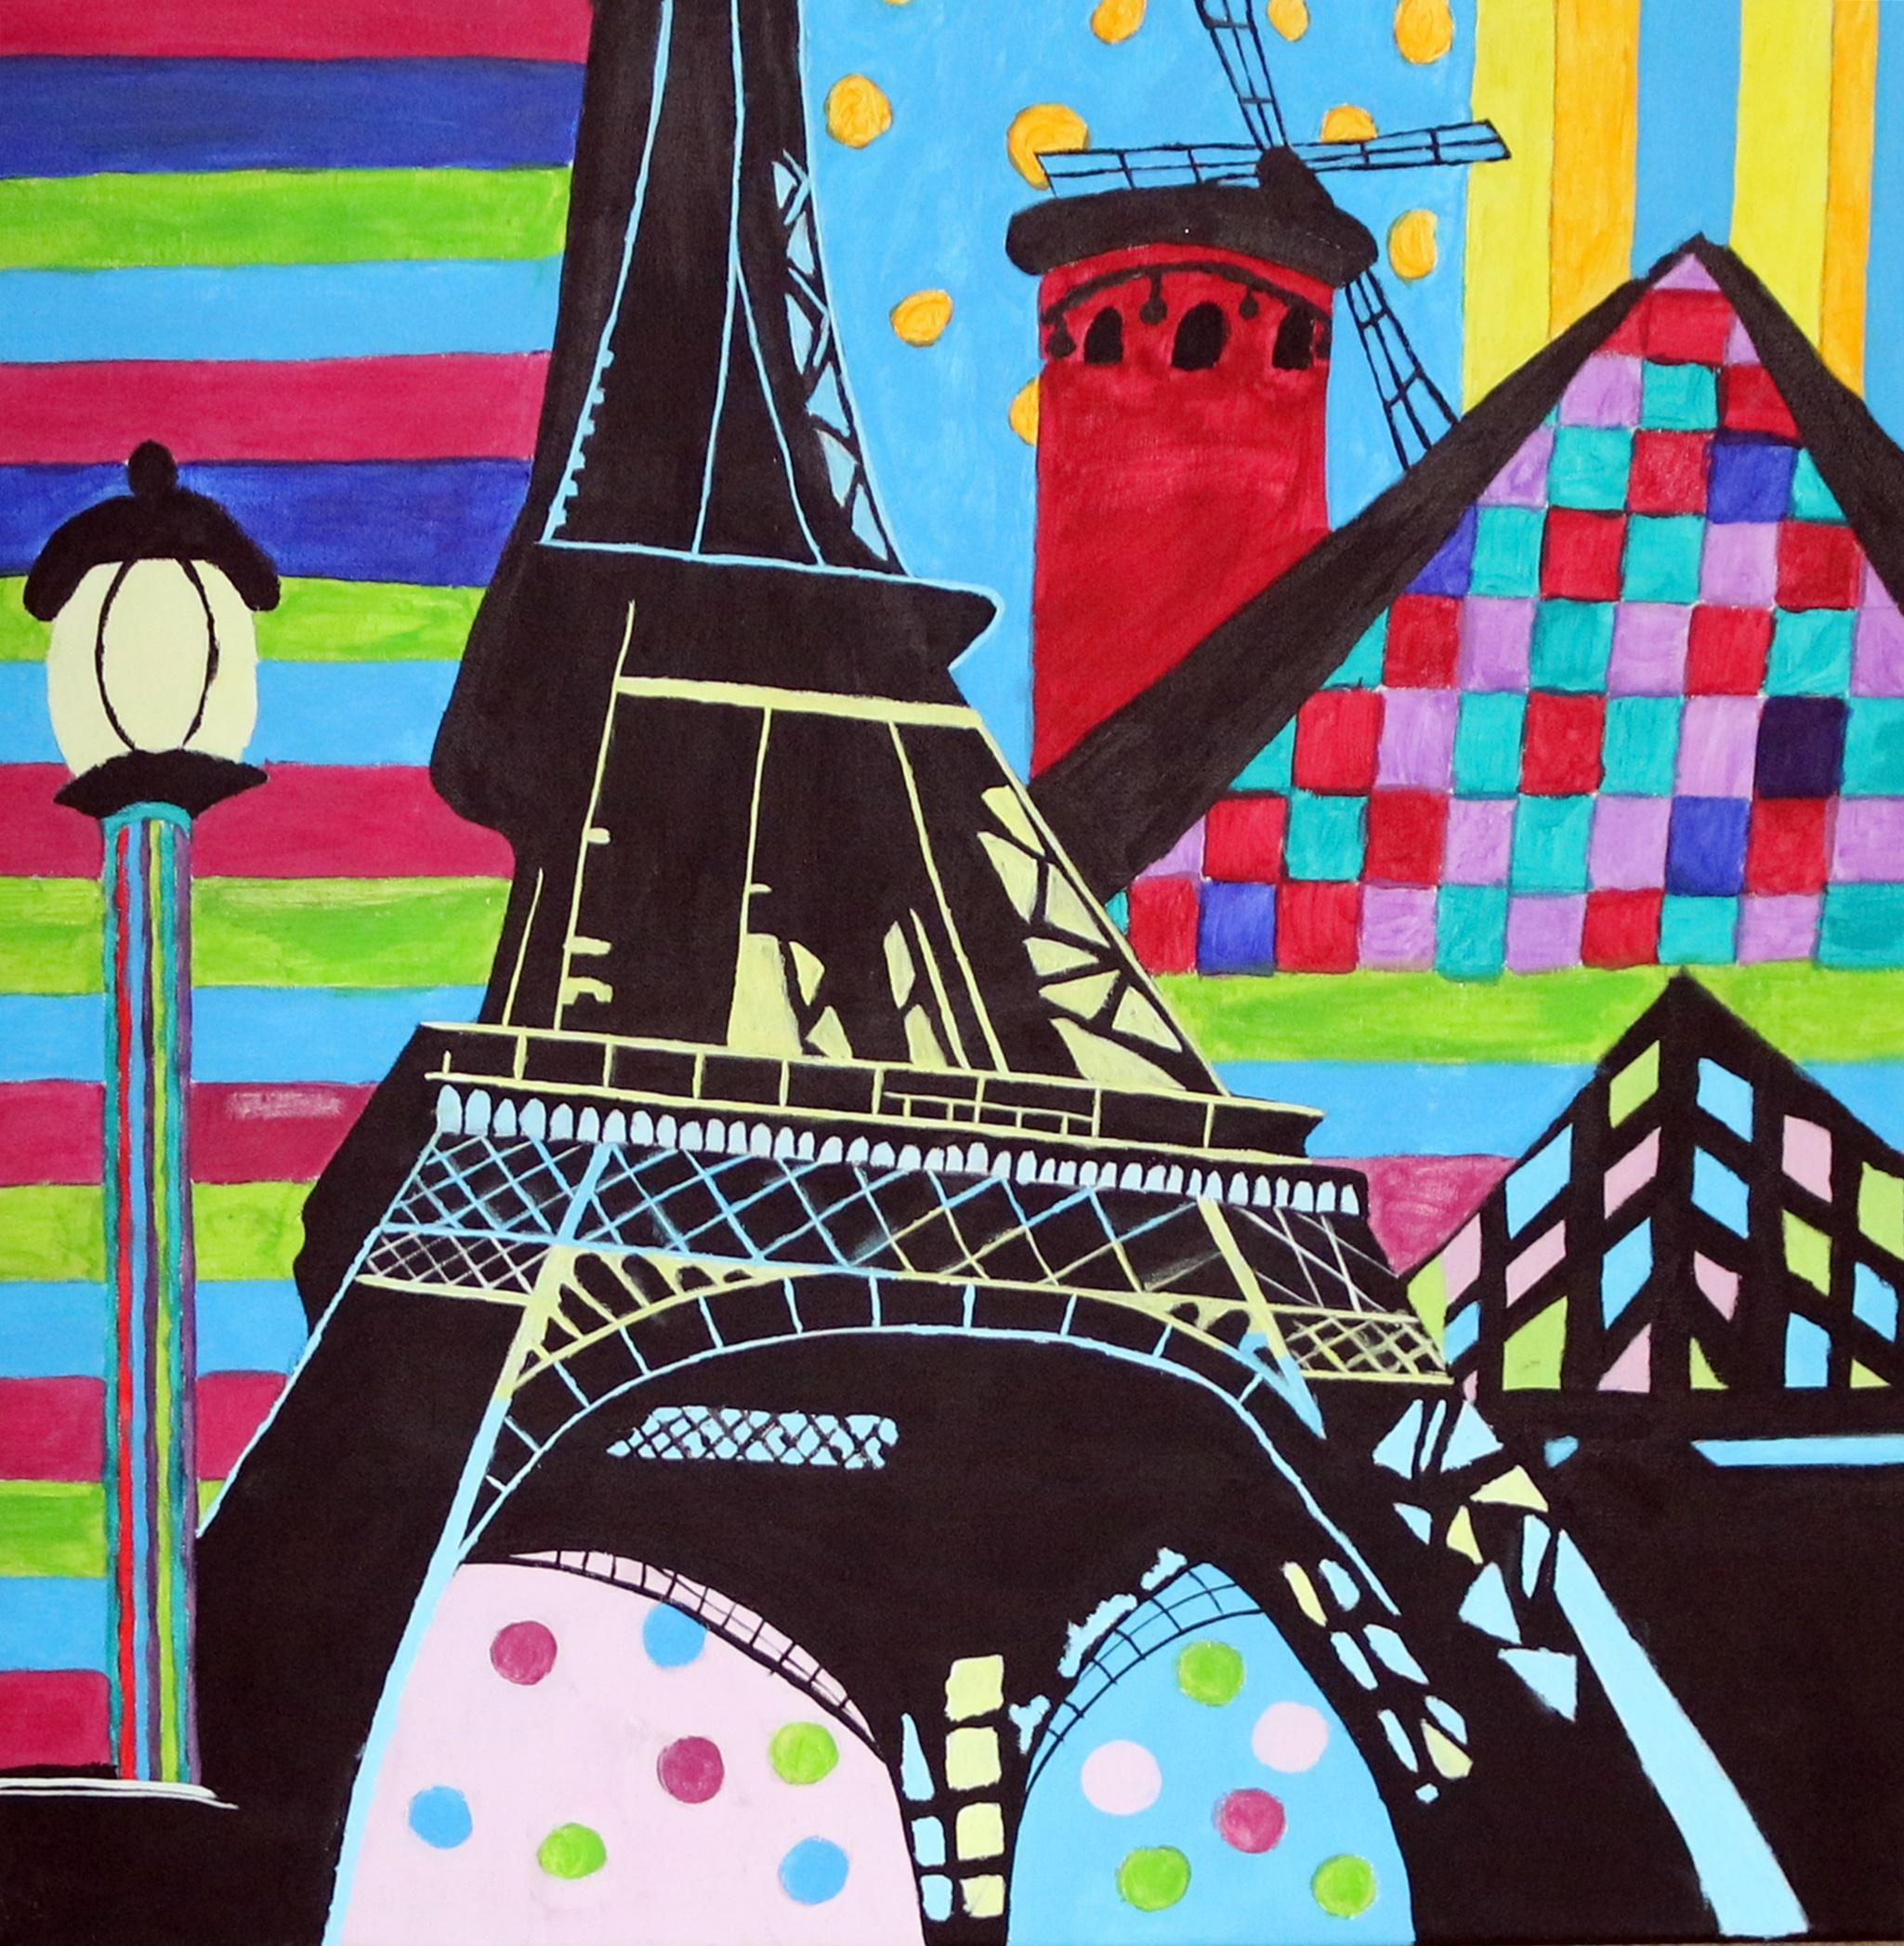 Eifelturm Louvre et moulin Rouge